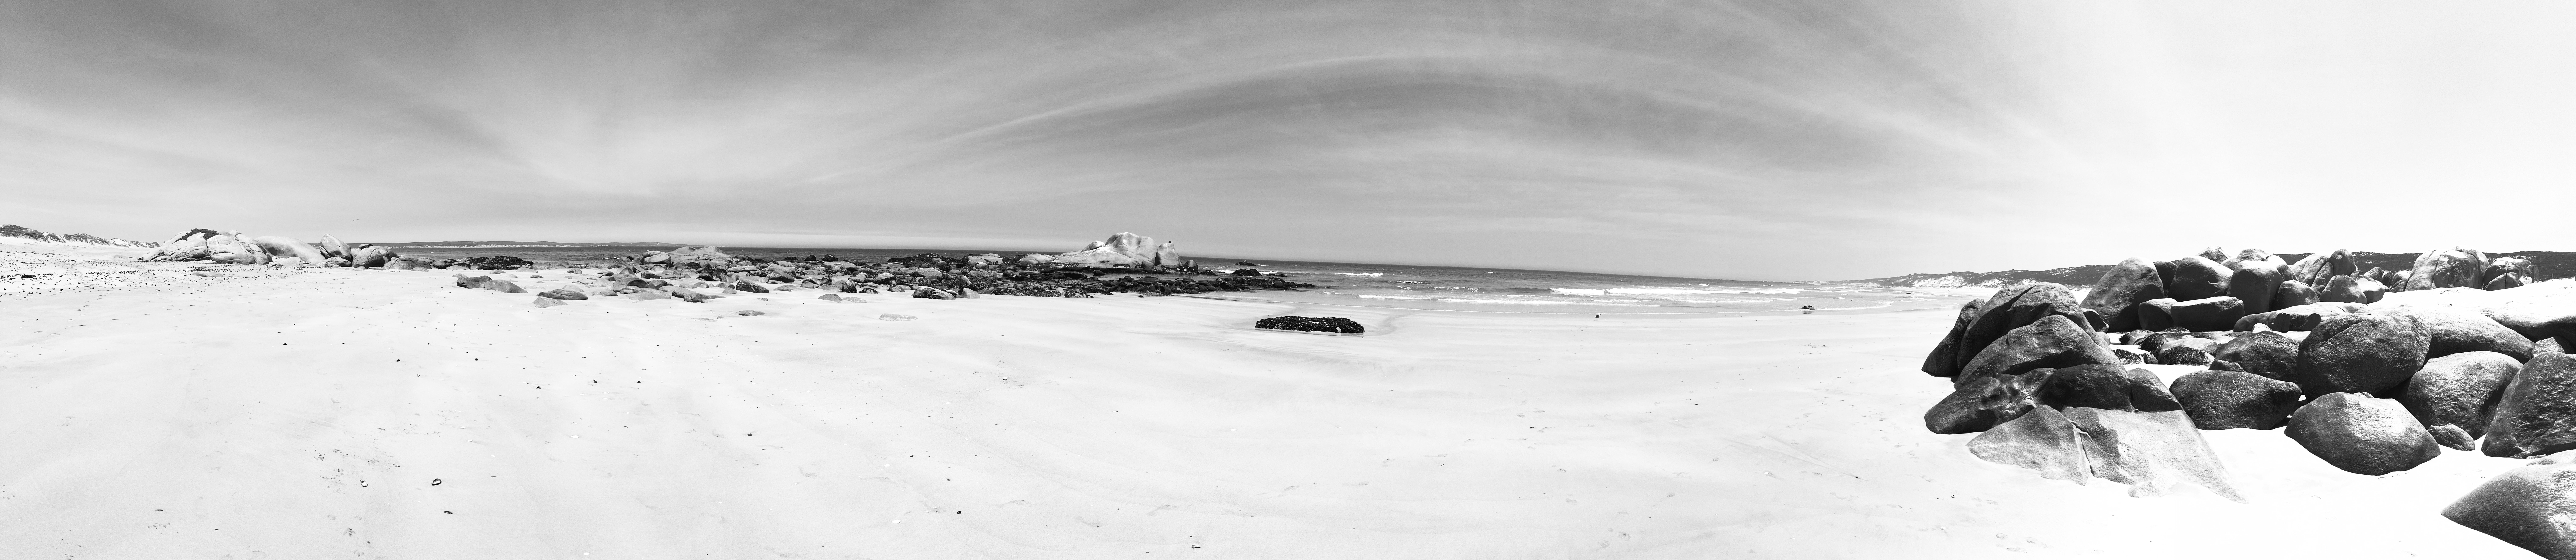 Strand in Südafrika ©Johannes Ratermann